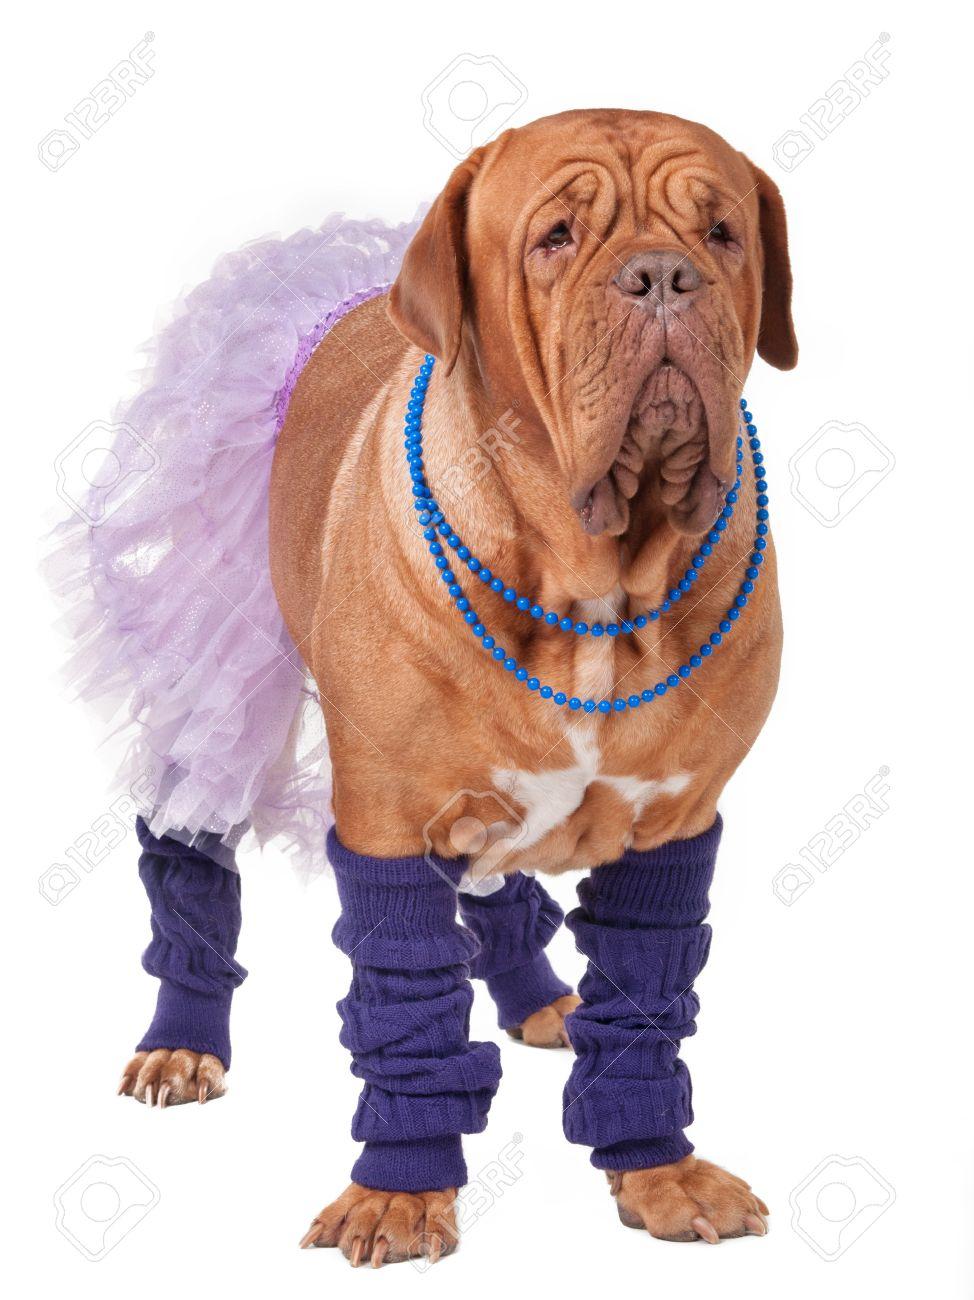 Big dogue de bordeaux dressed like ballerina isolated on white Stock Photo - 11550618